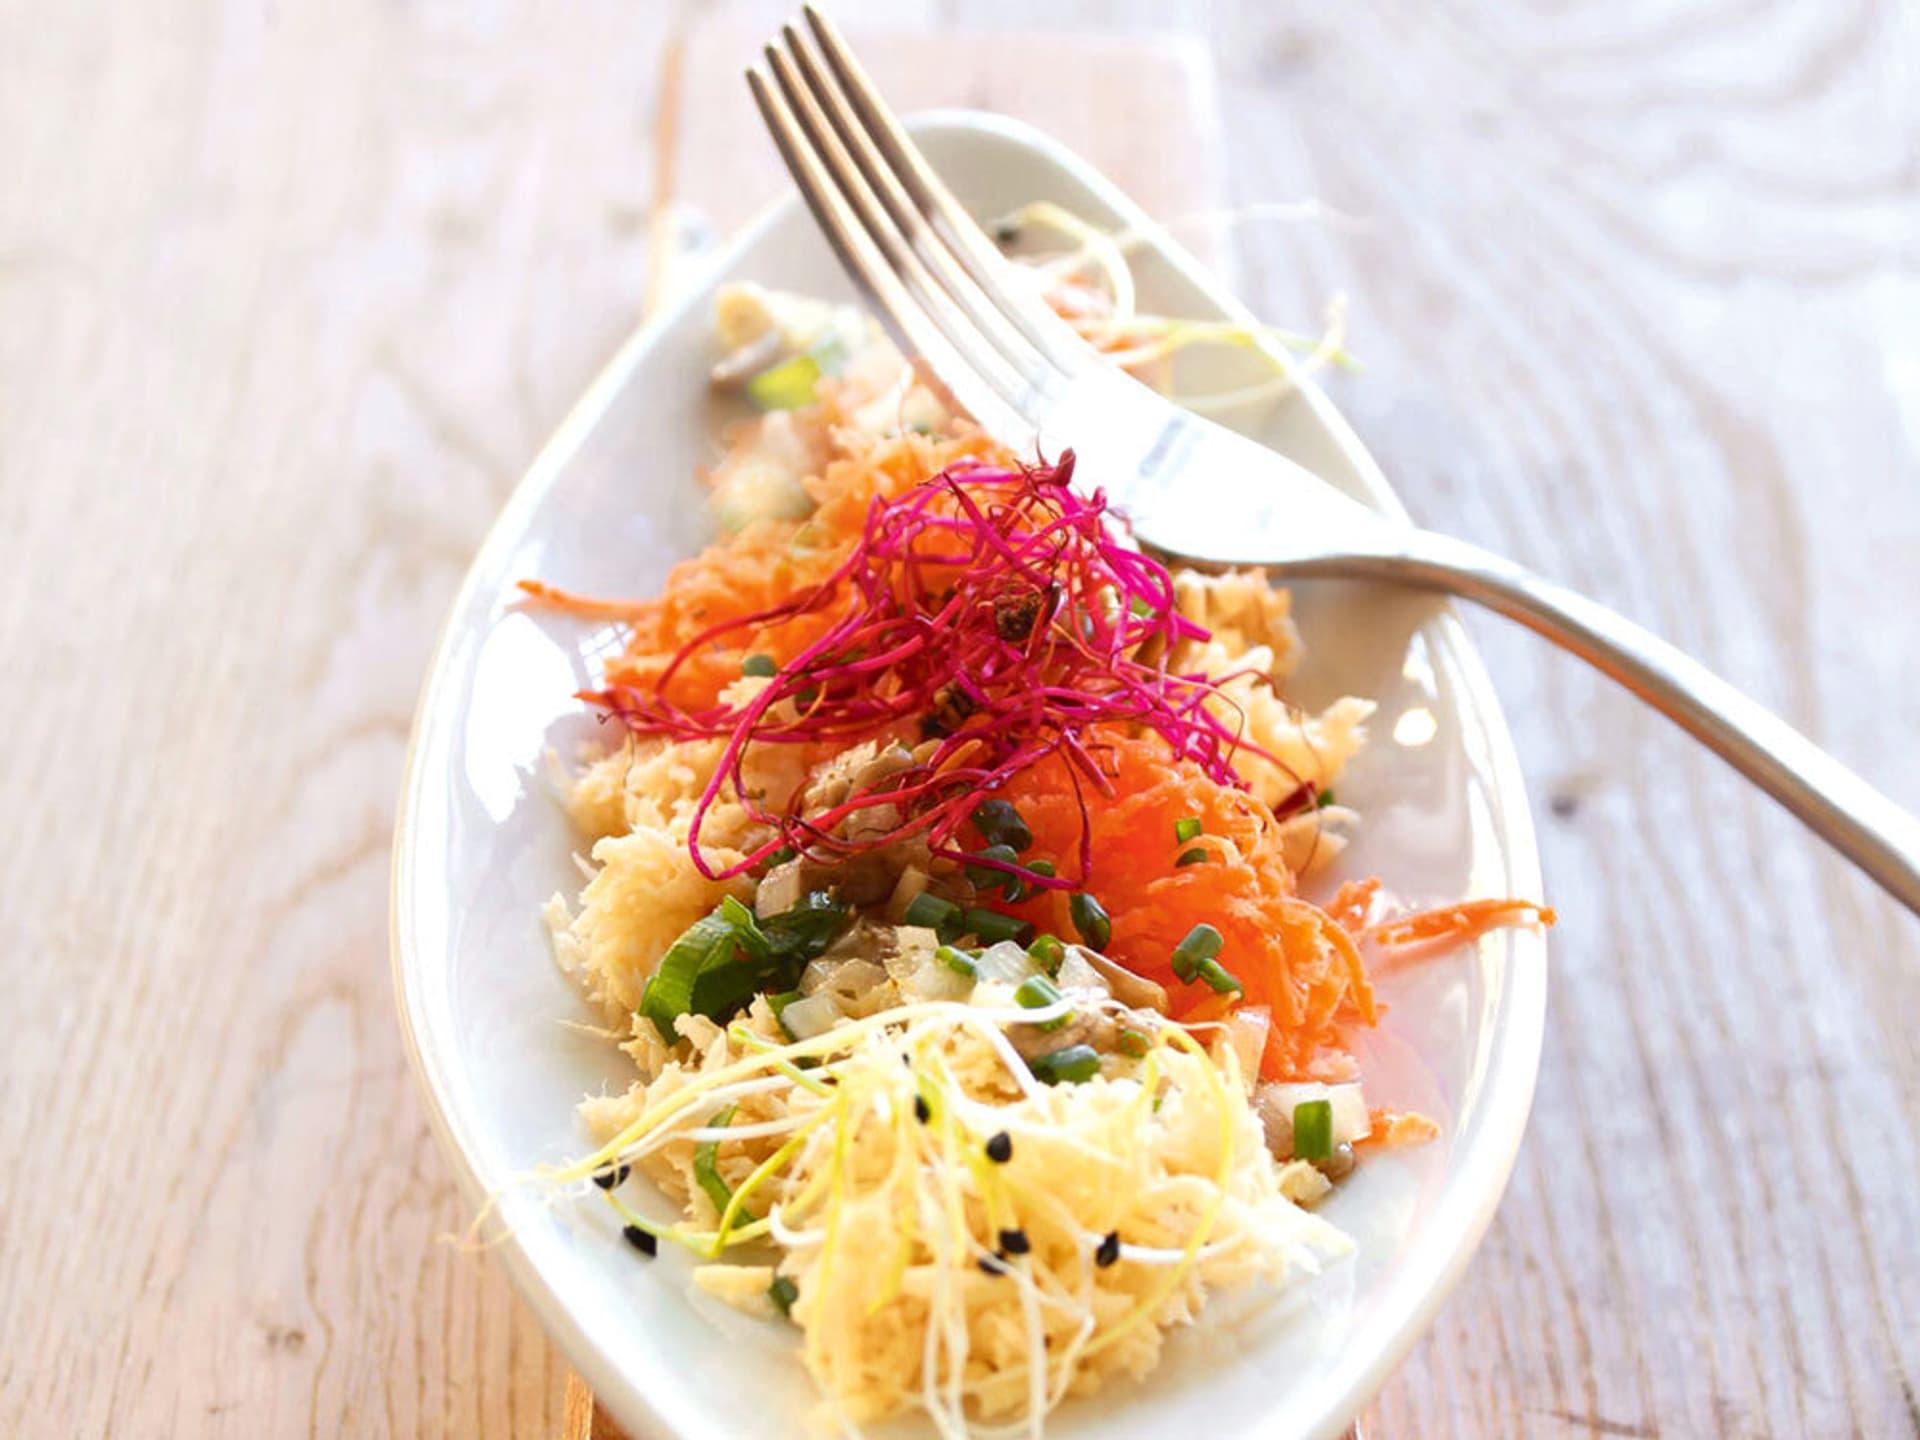 Karotten-Pastinaken-Salat